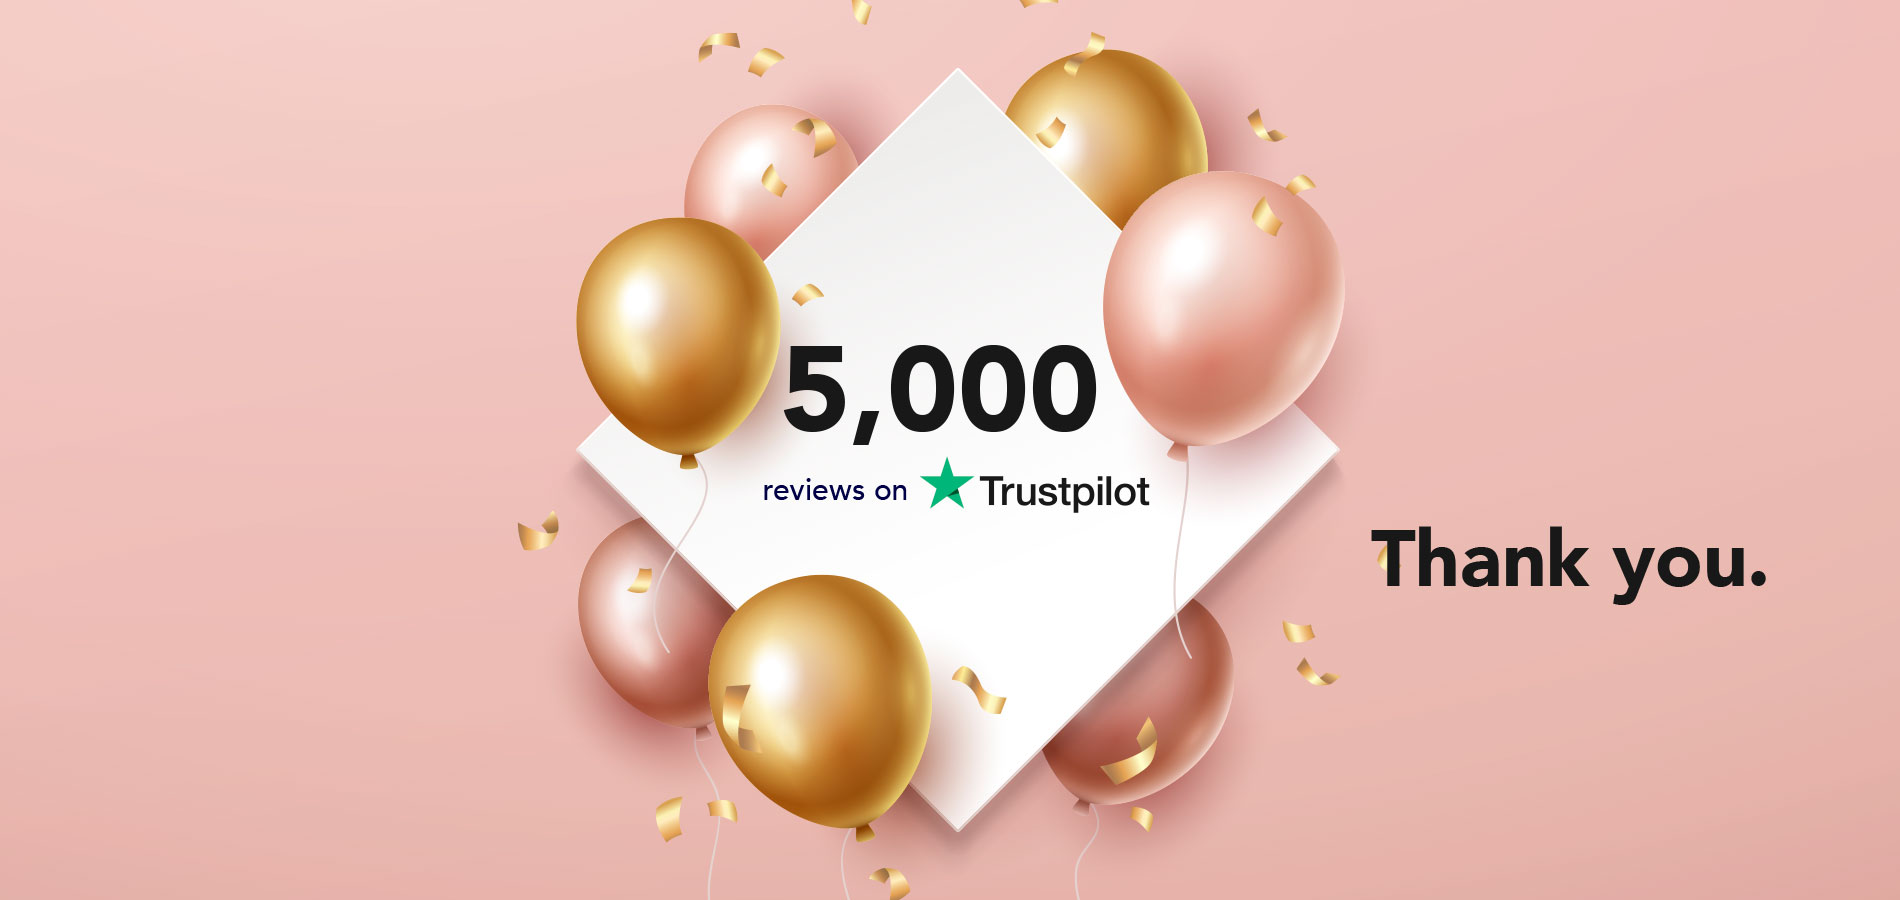 5,000 Reviews on Trustpilot!